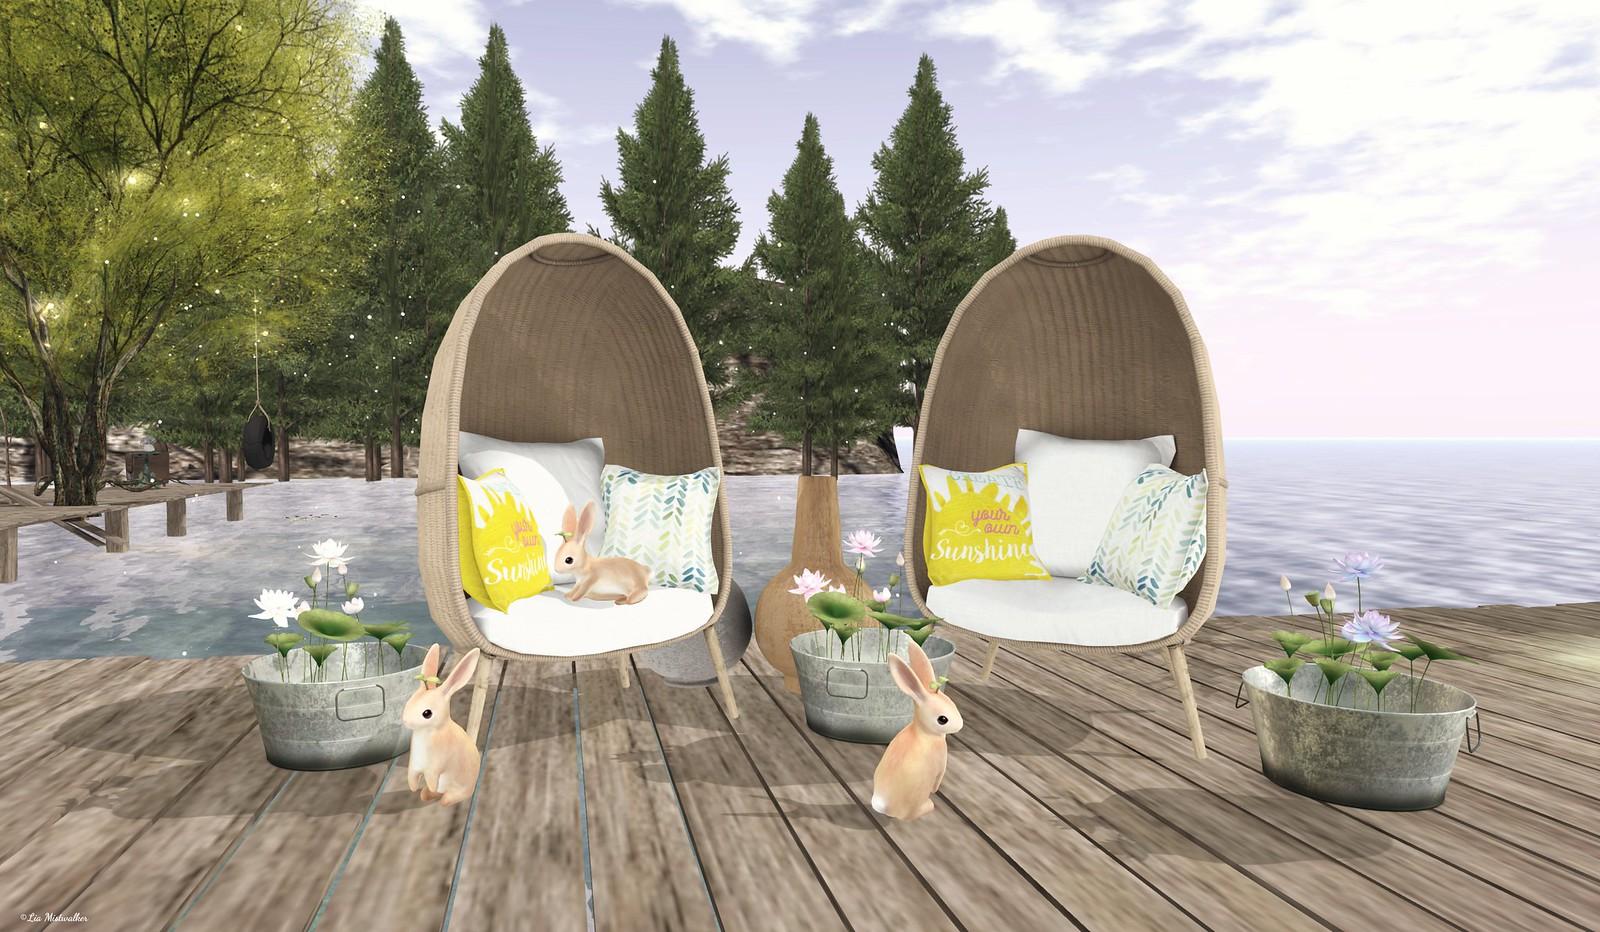 Fashion Therapy Home & Garden # 208